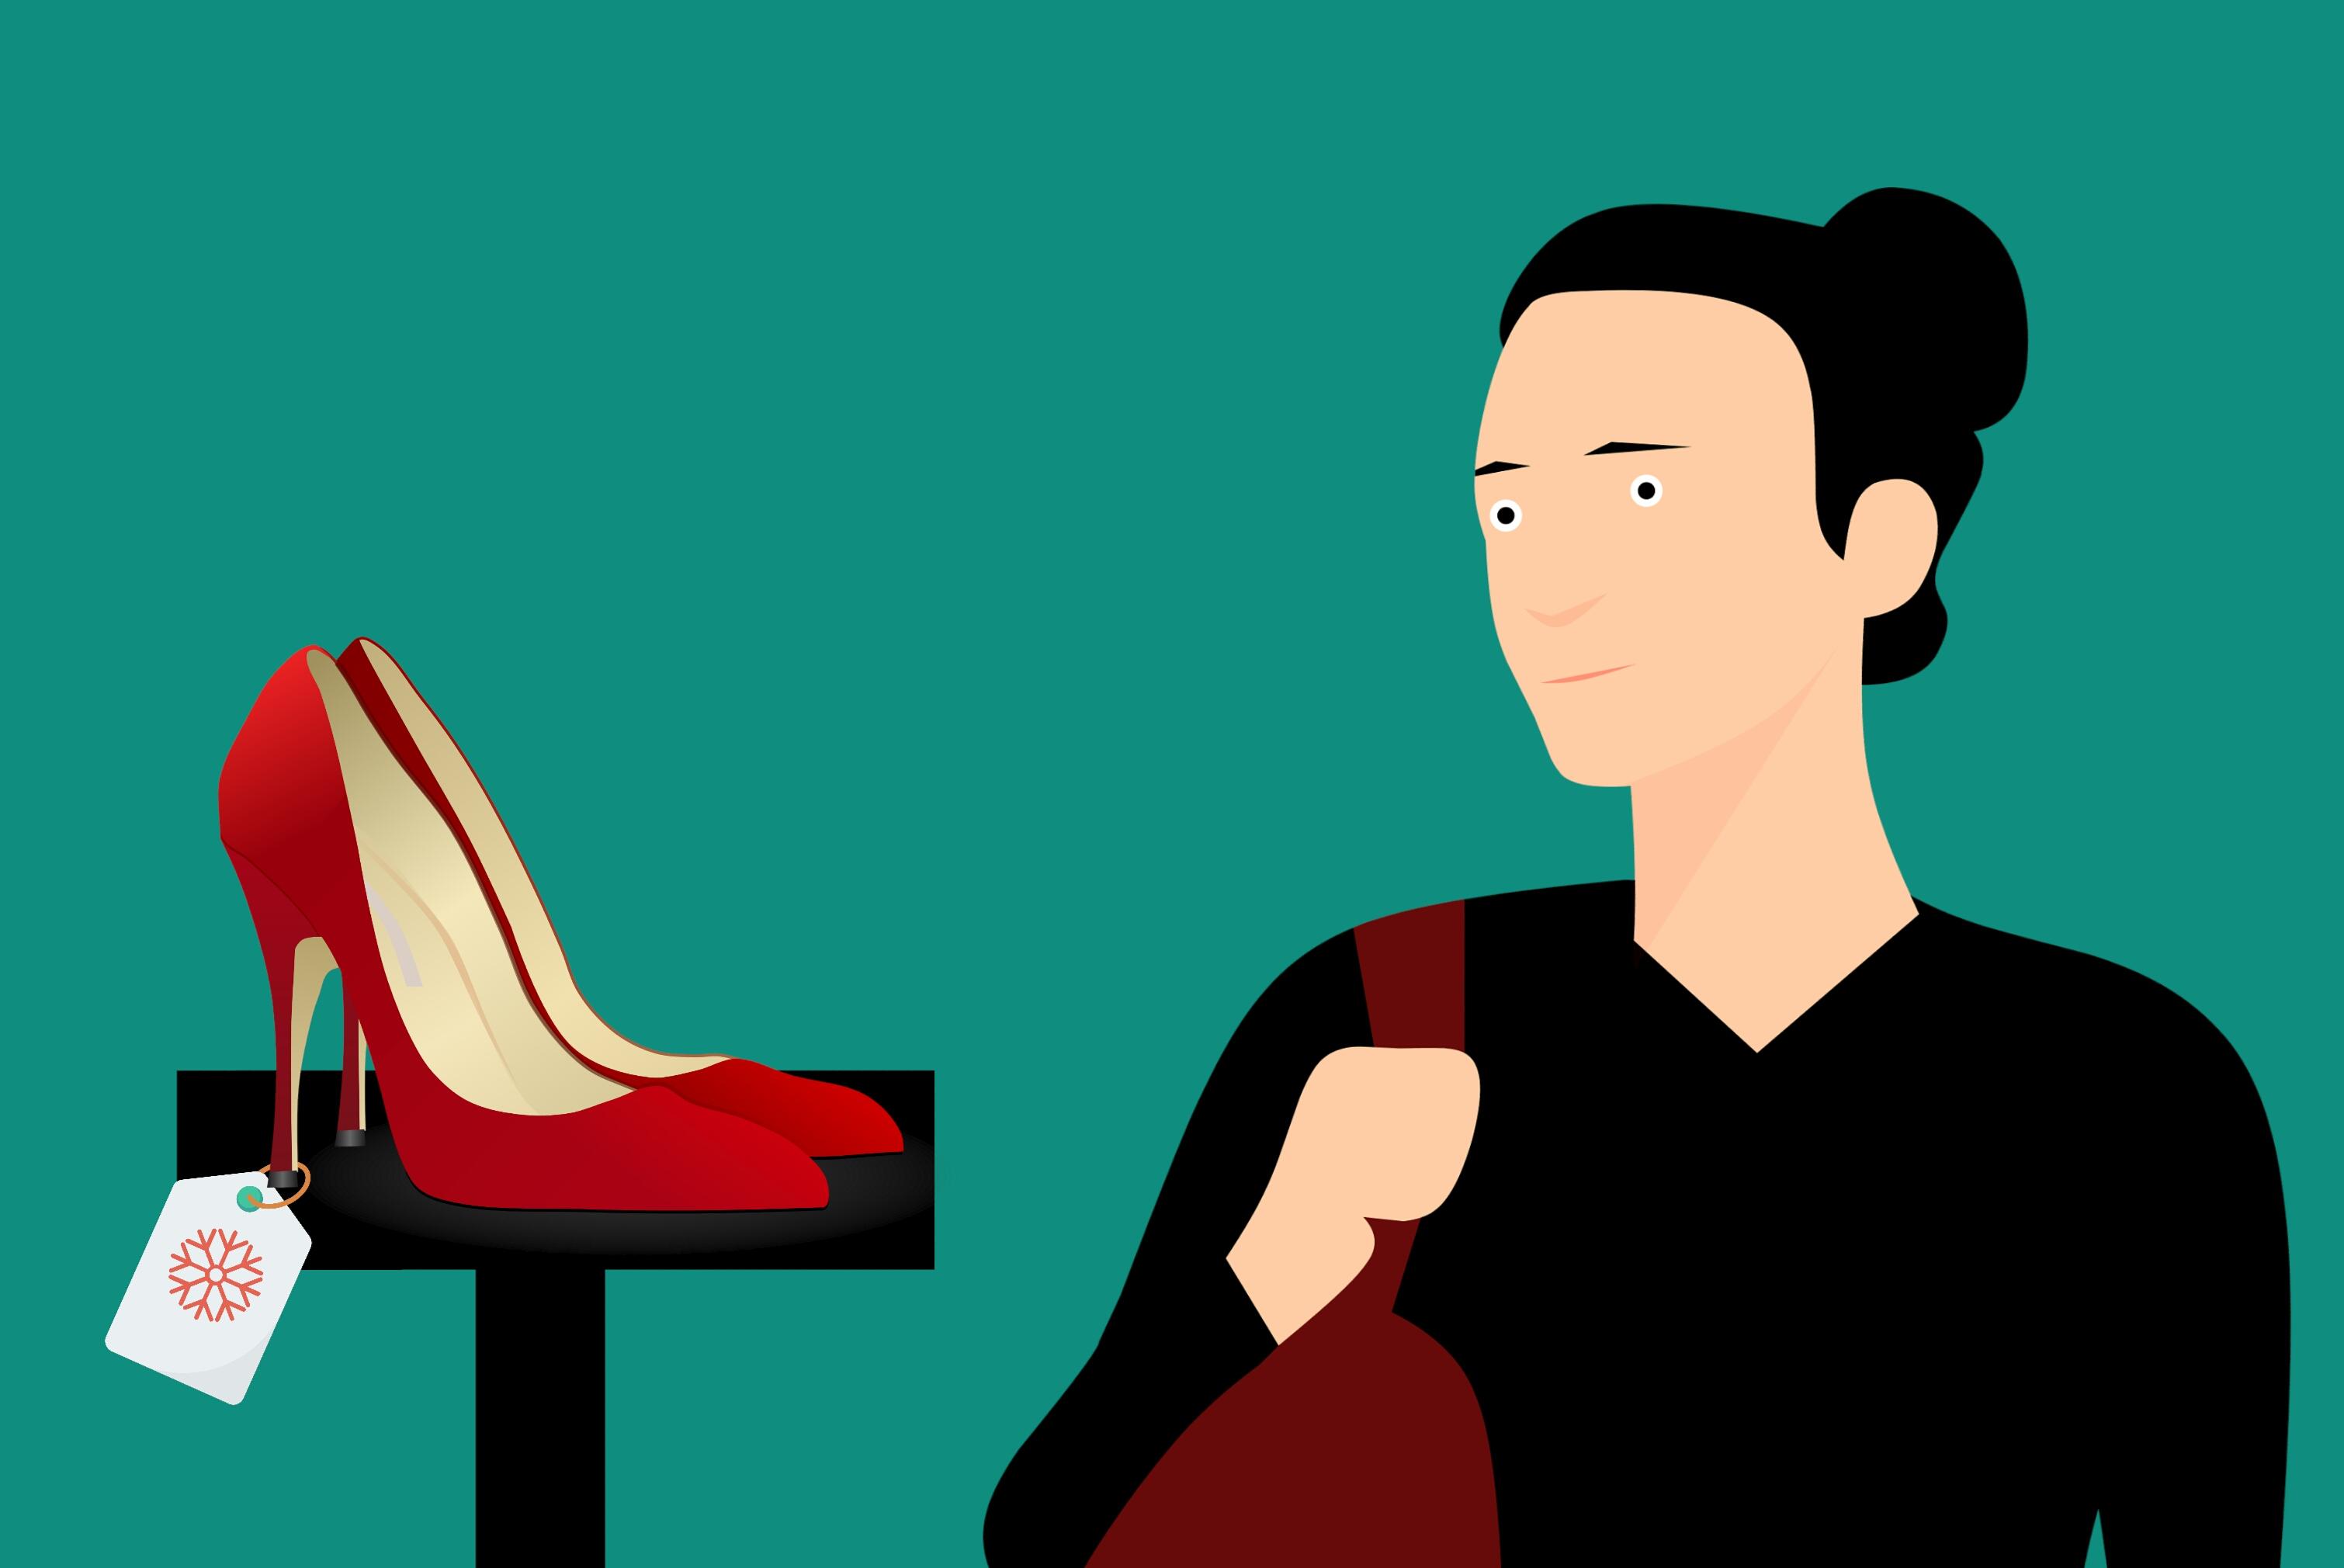 Free Images Fashion Footwear Girl Shoe Shop Shopping Store